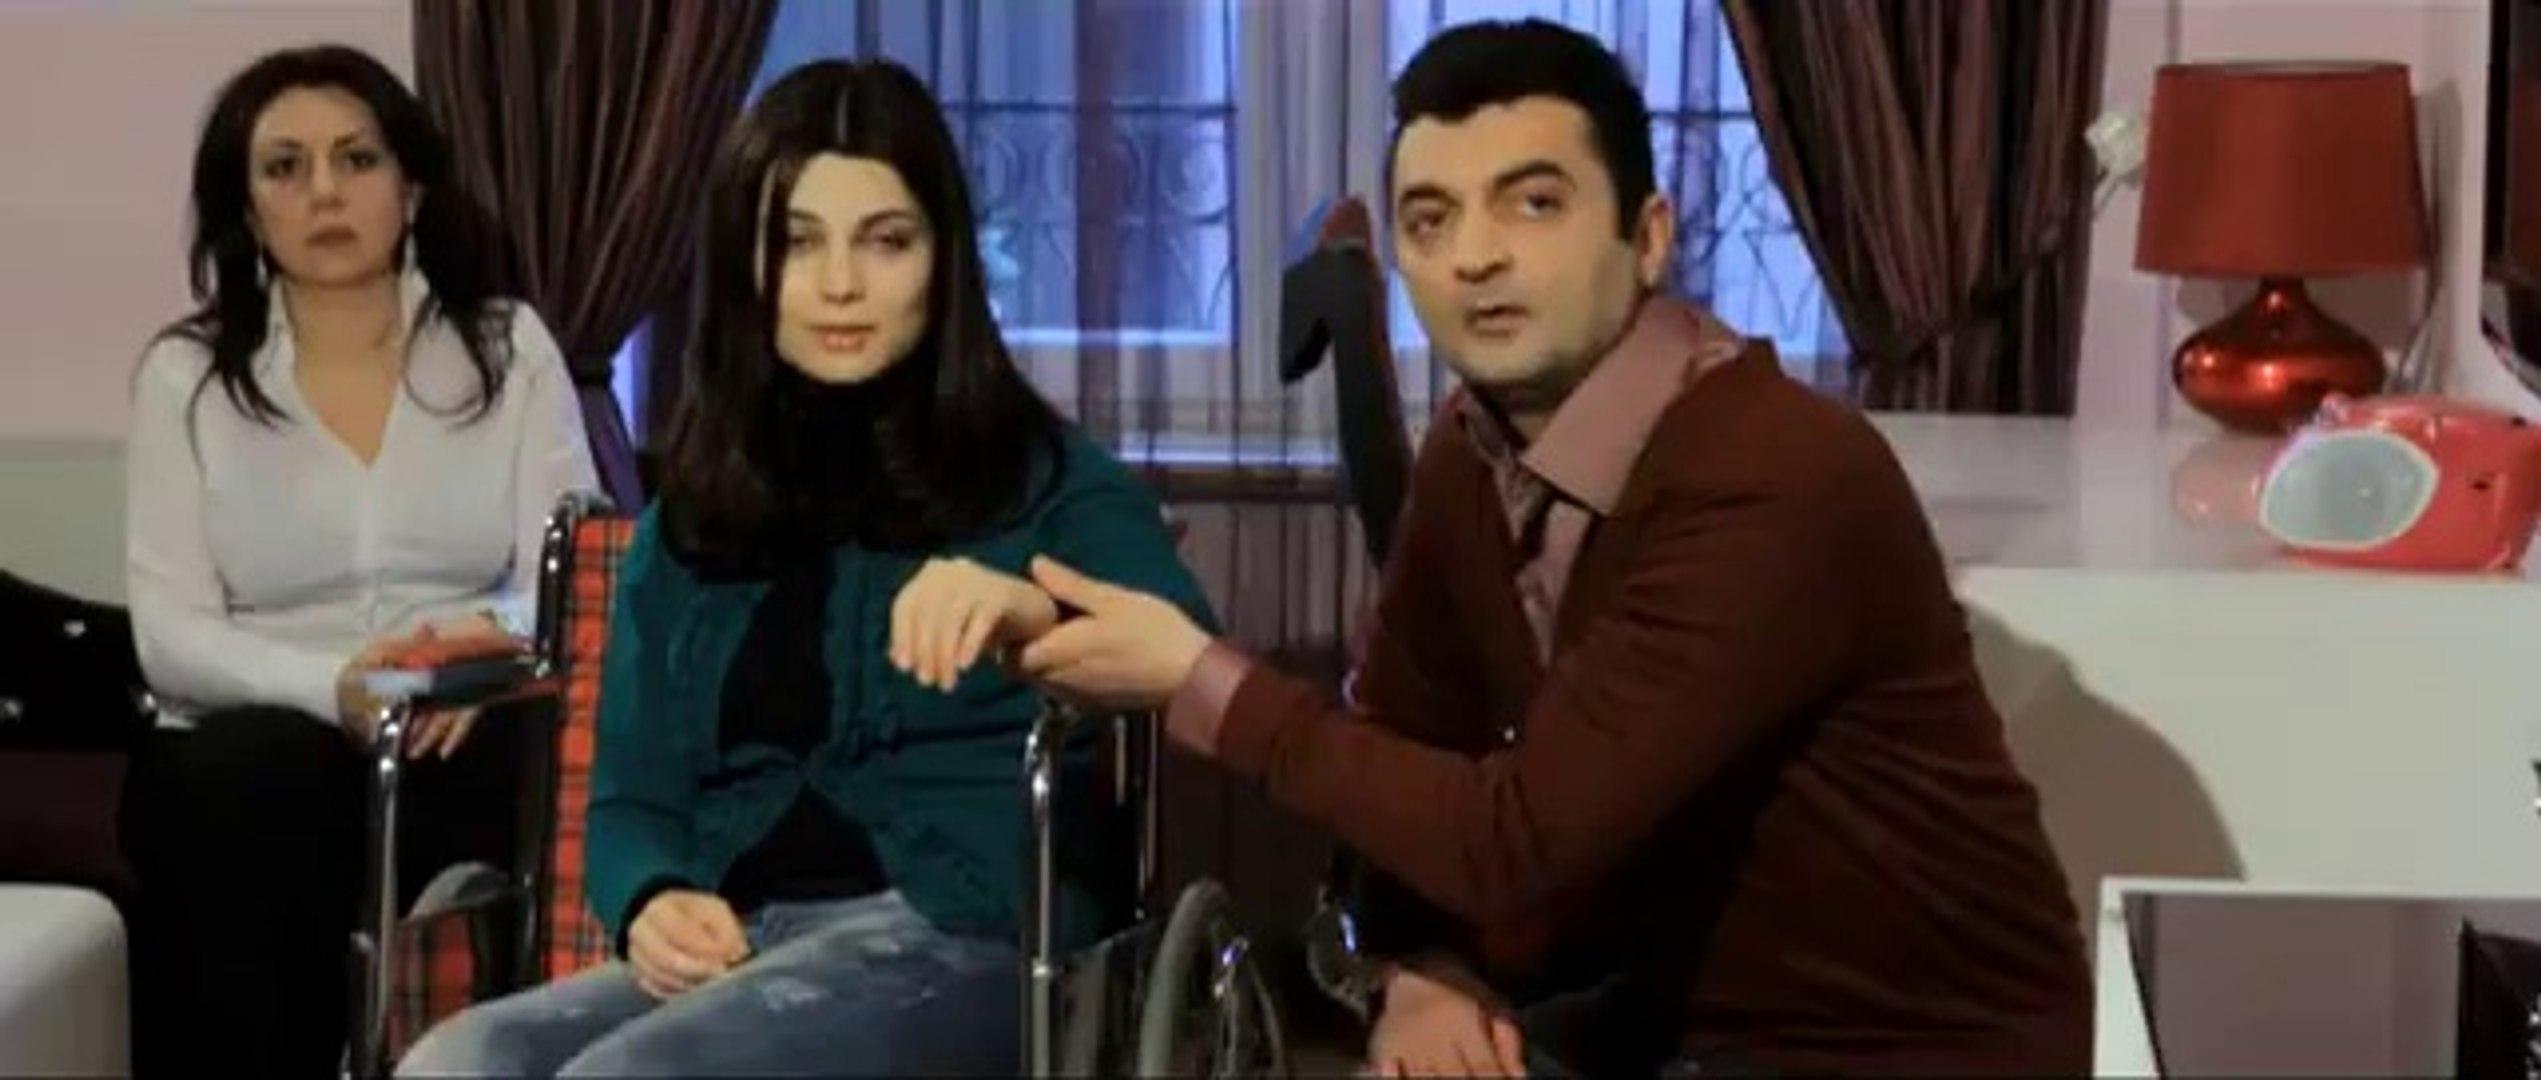 Смотреть онлайн армянский сериал Xaghic durs_8